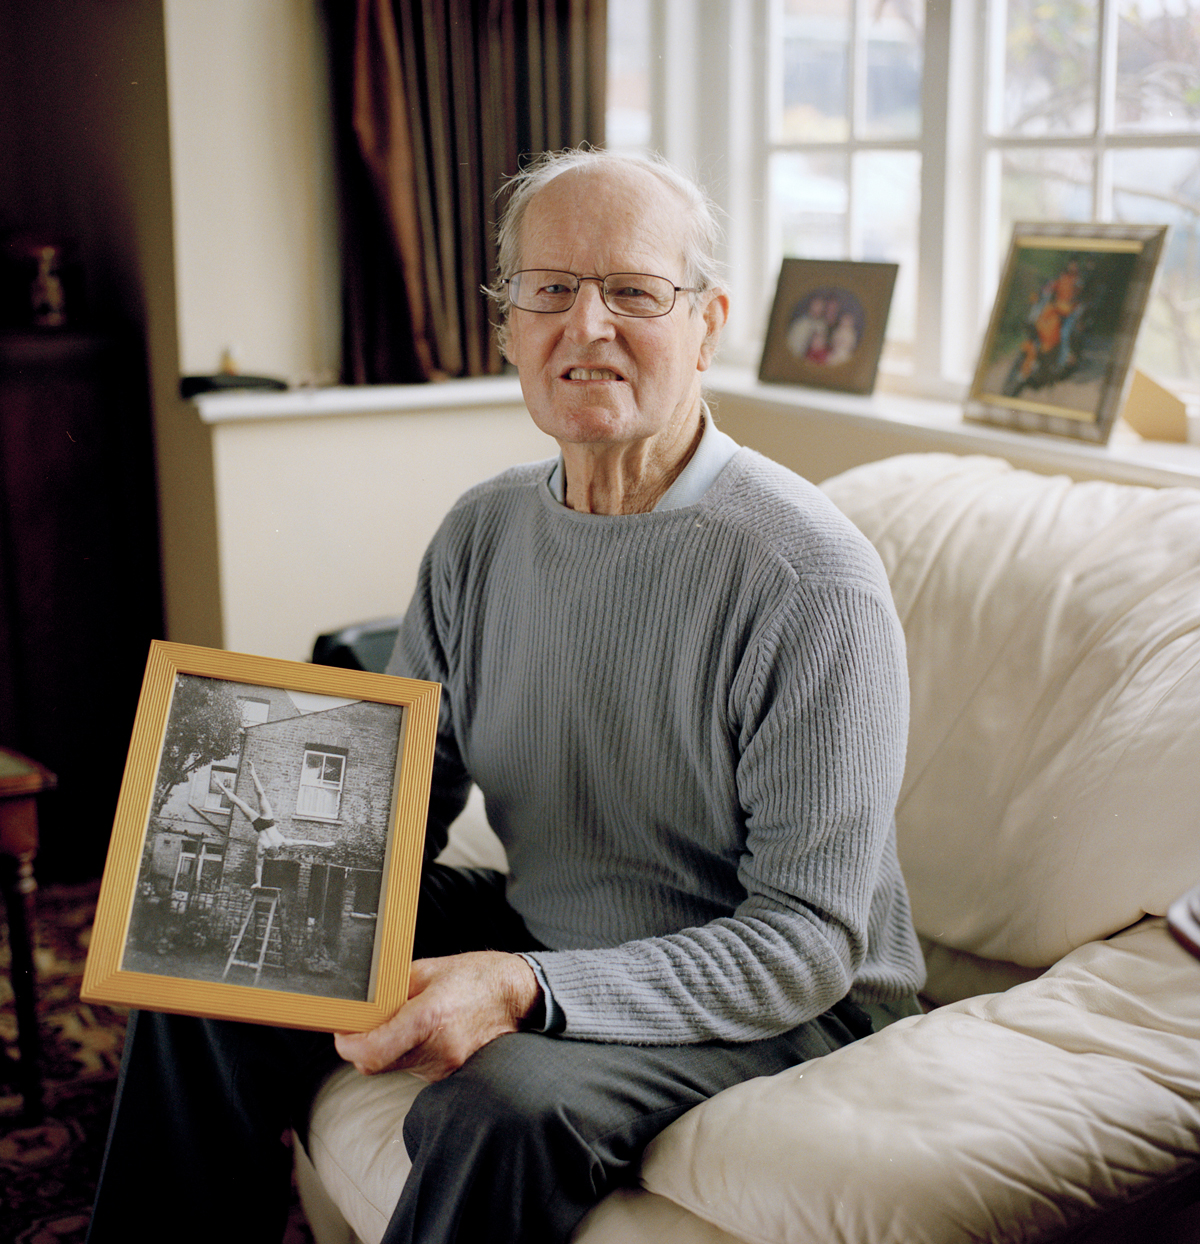 George Weedon-Olympic gymnast